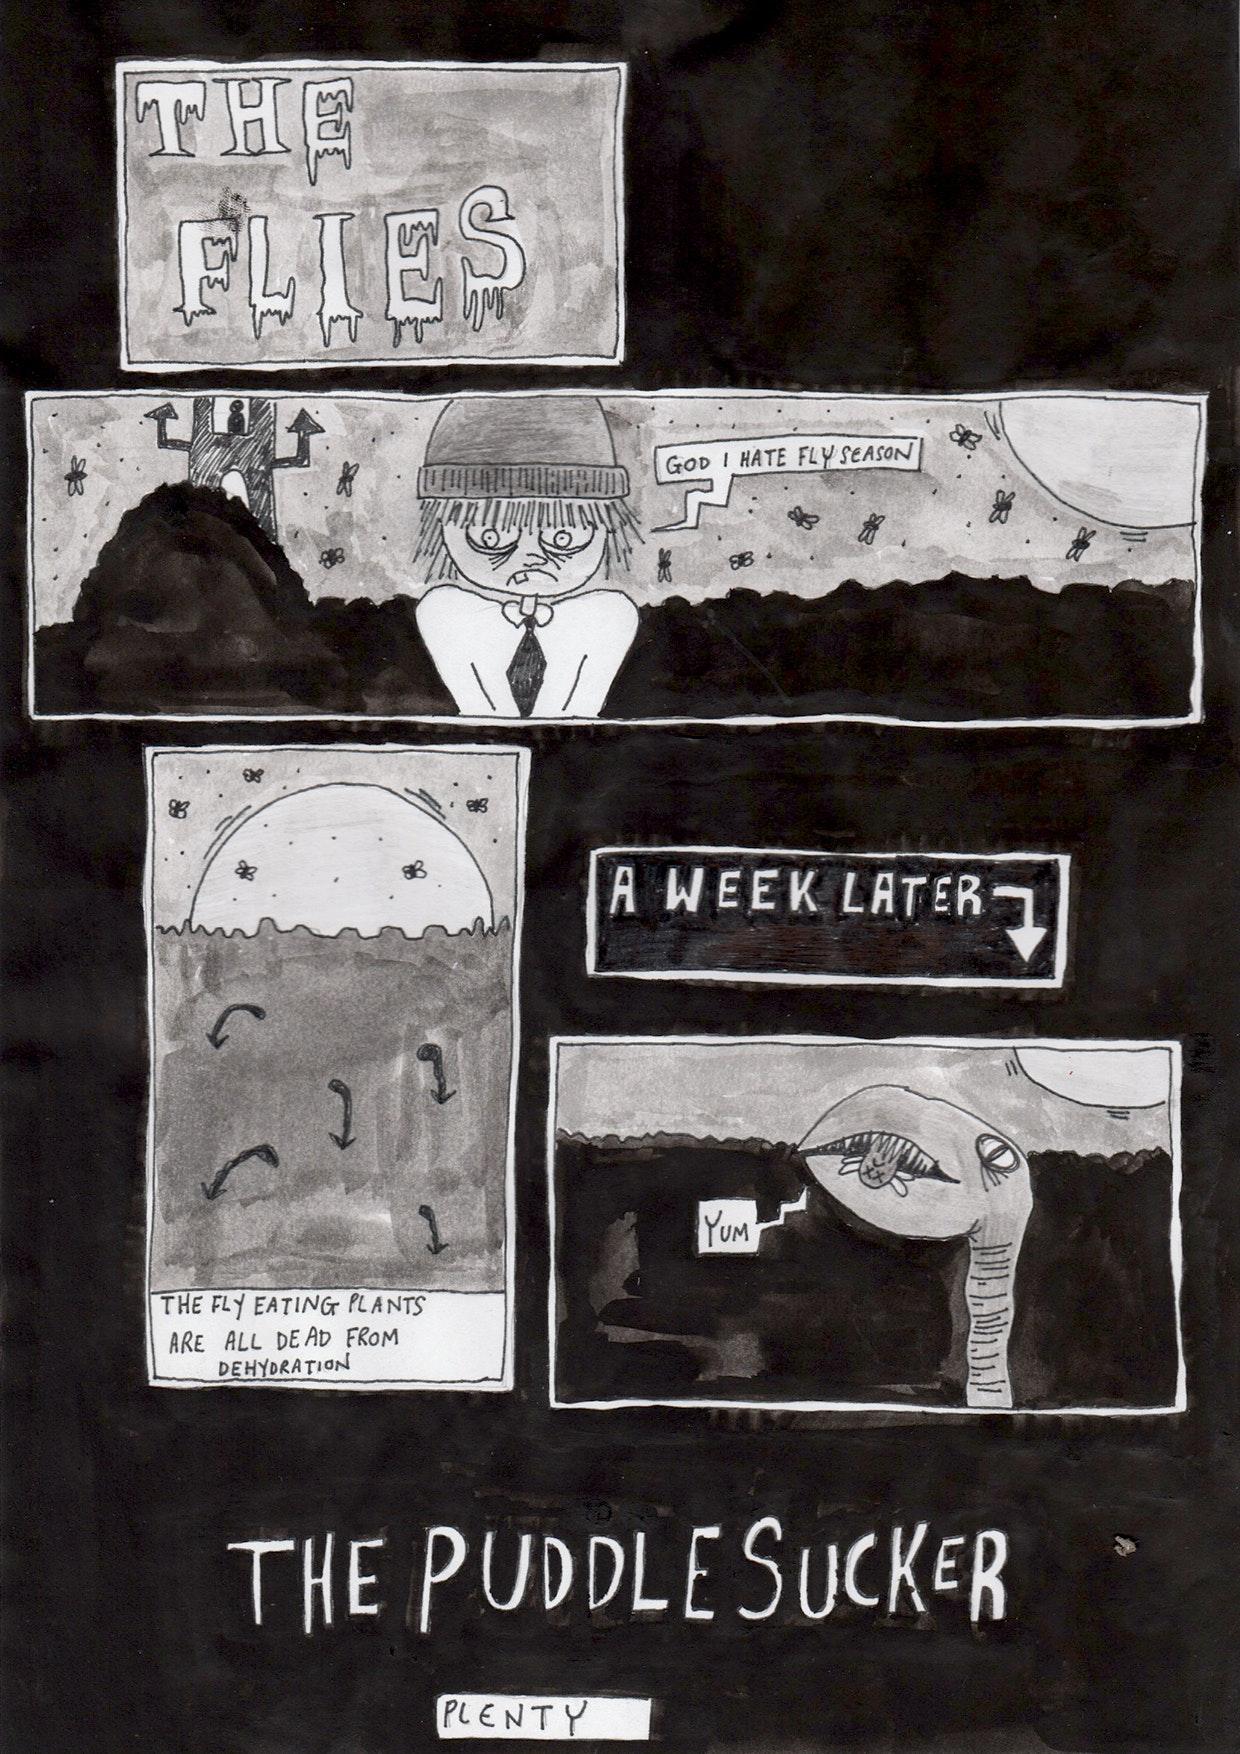 Alexandra Binding - The_Puddle_Sucker_flies